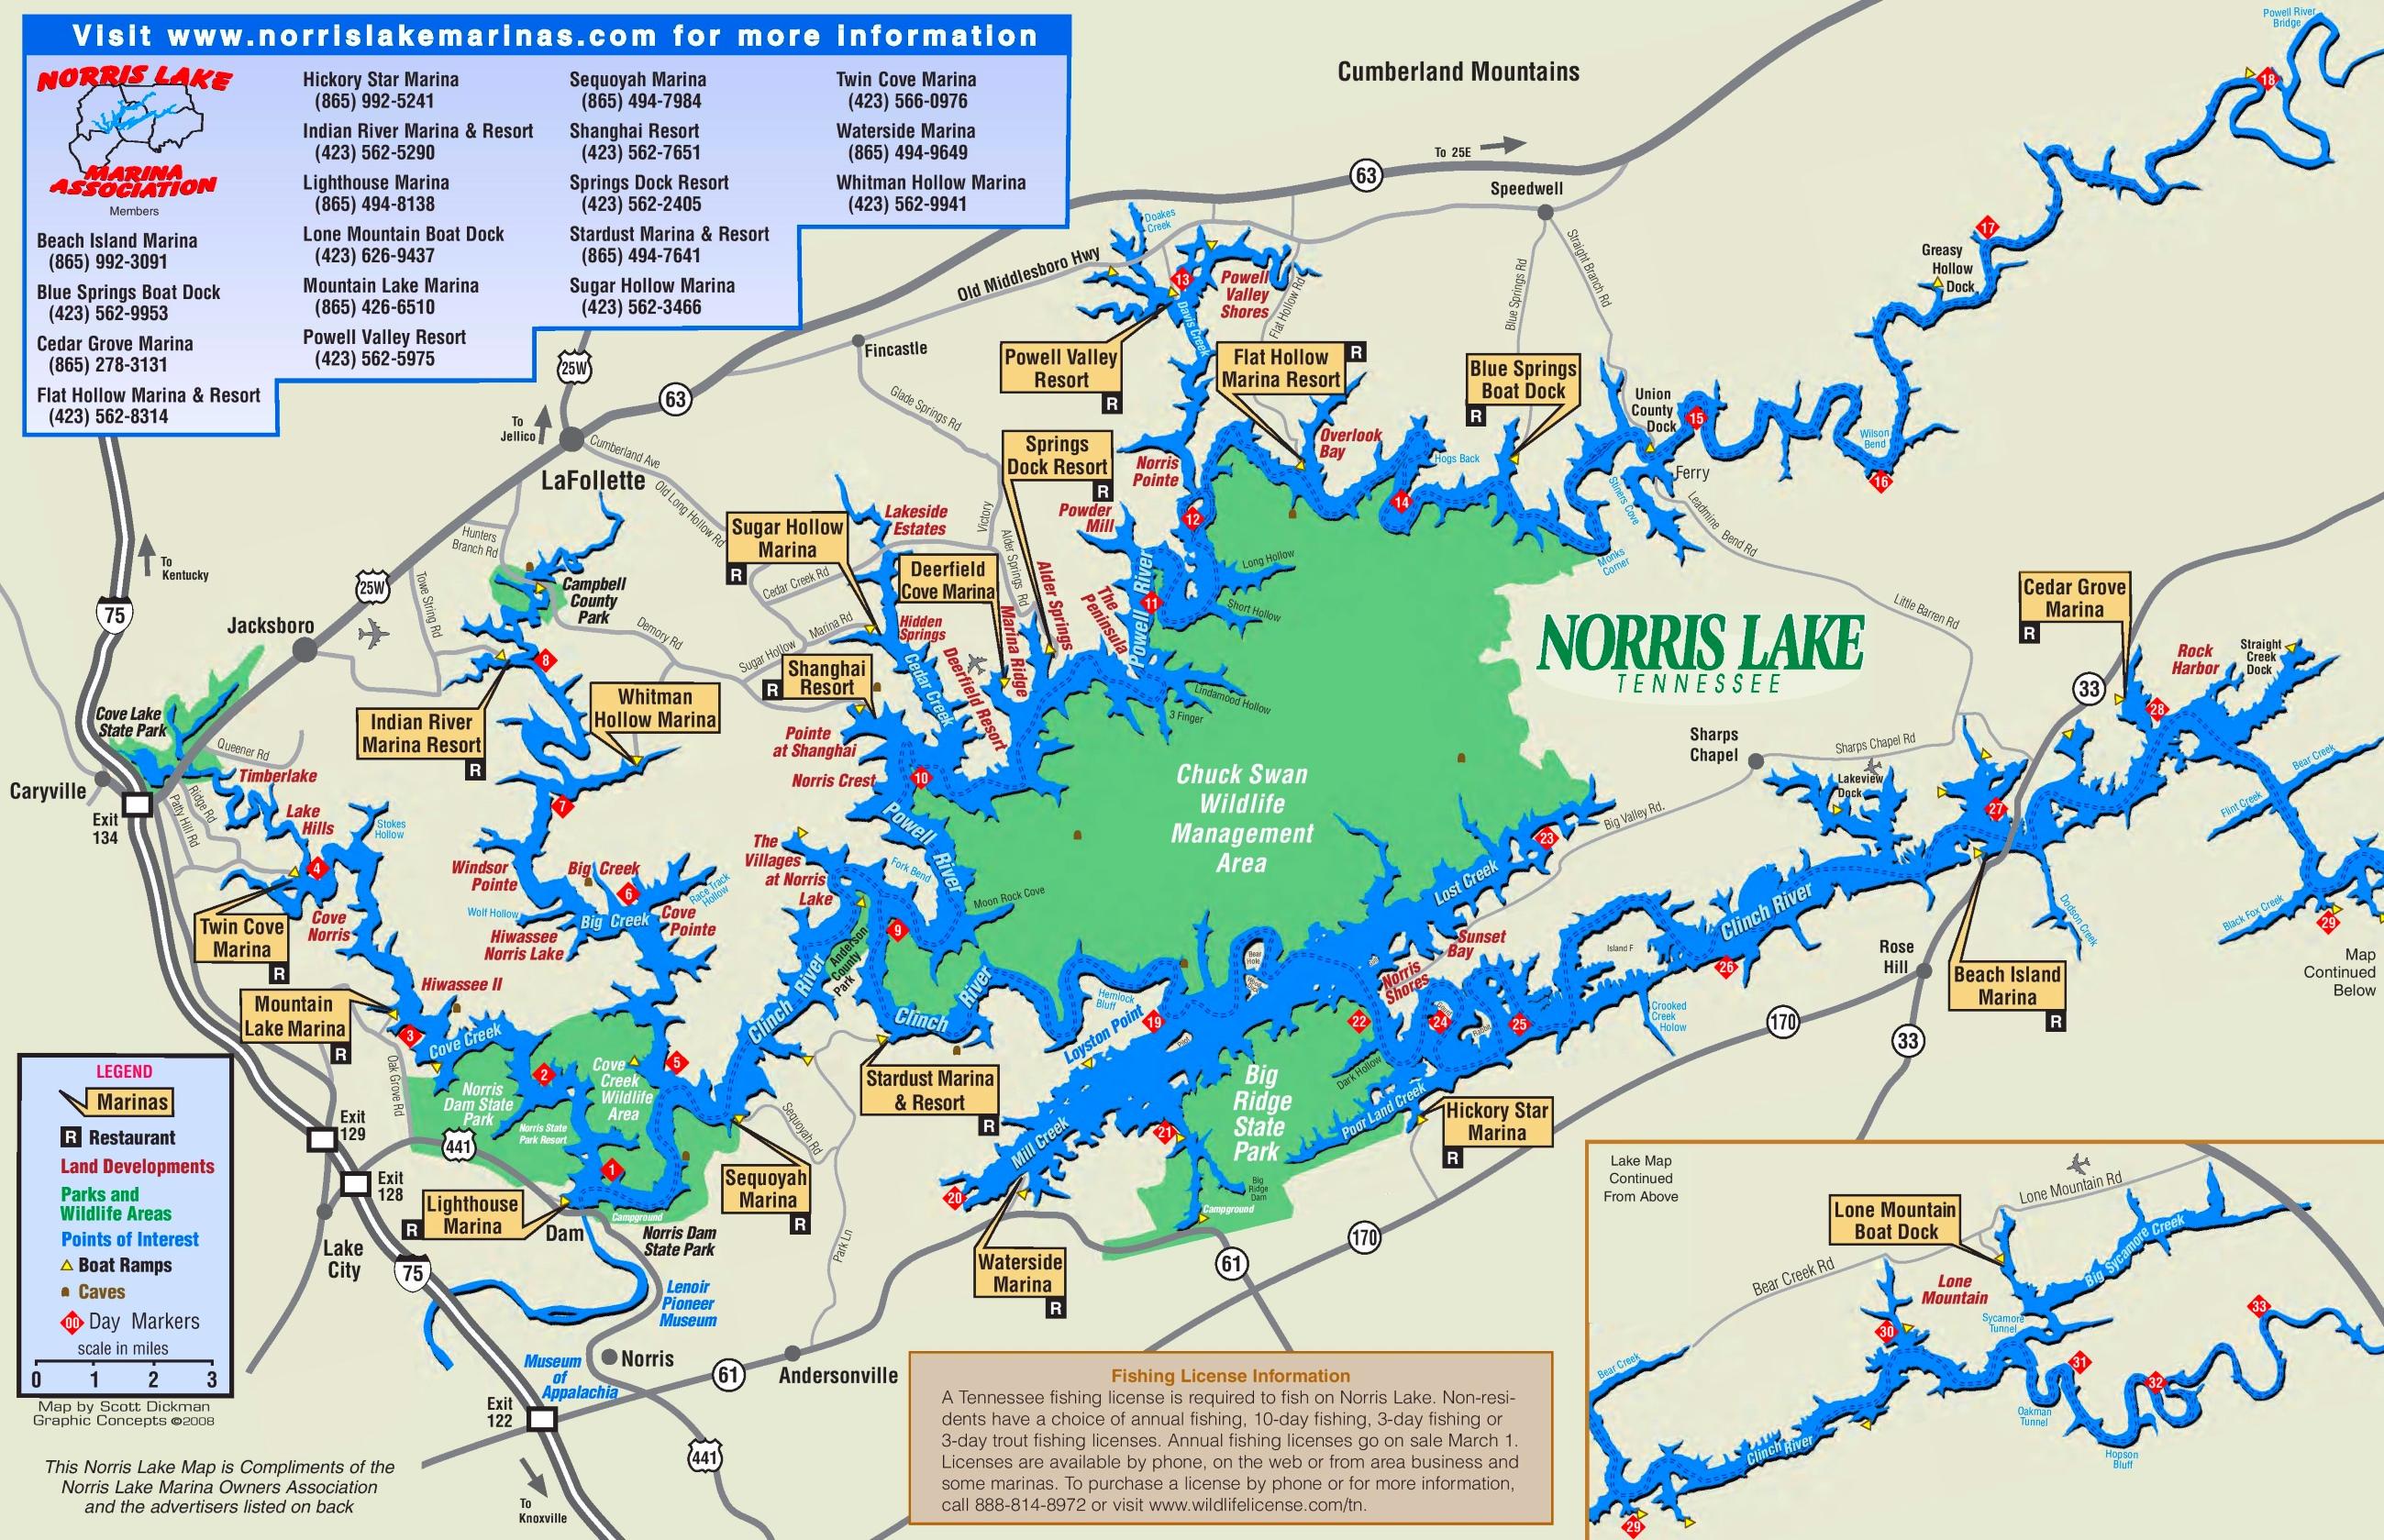 norris lake map tennessee Norris Lake Tourist Map norris lake map tennessee